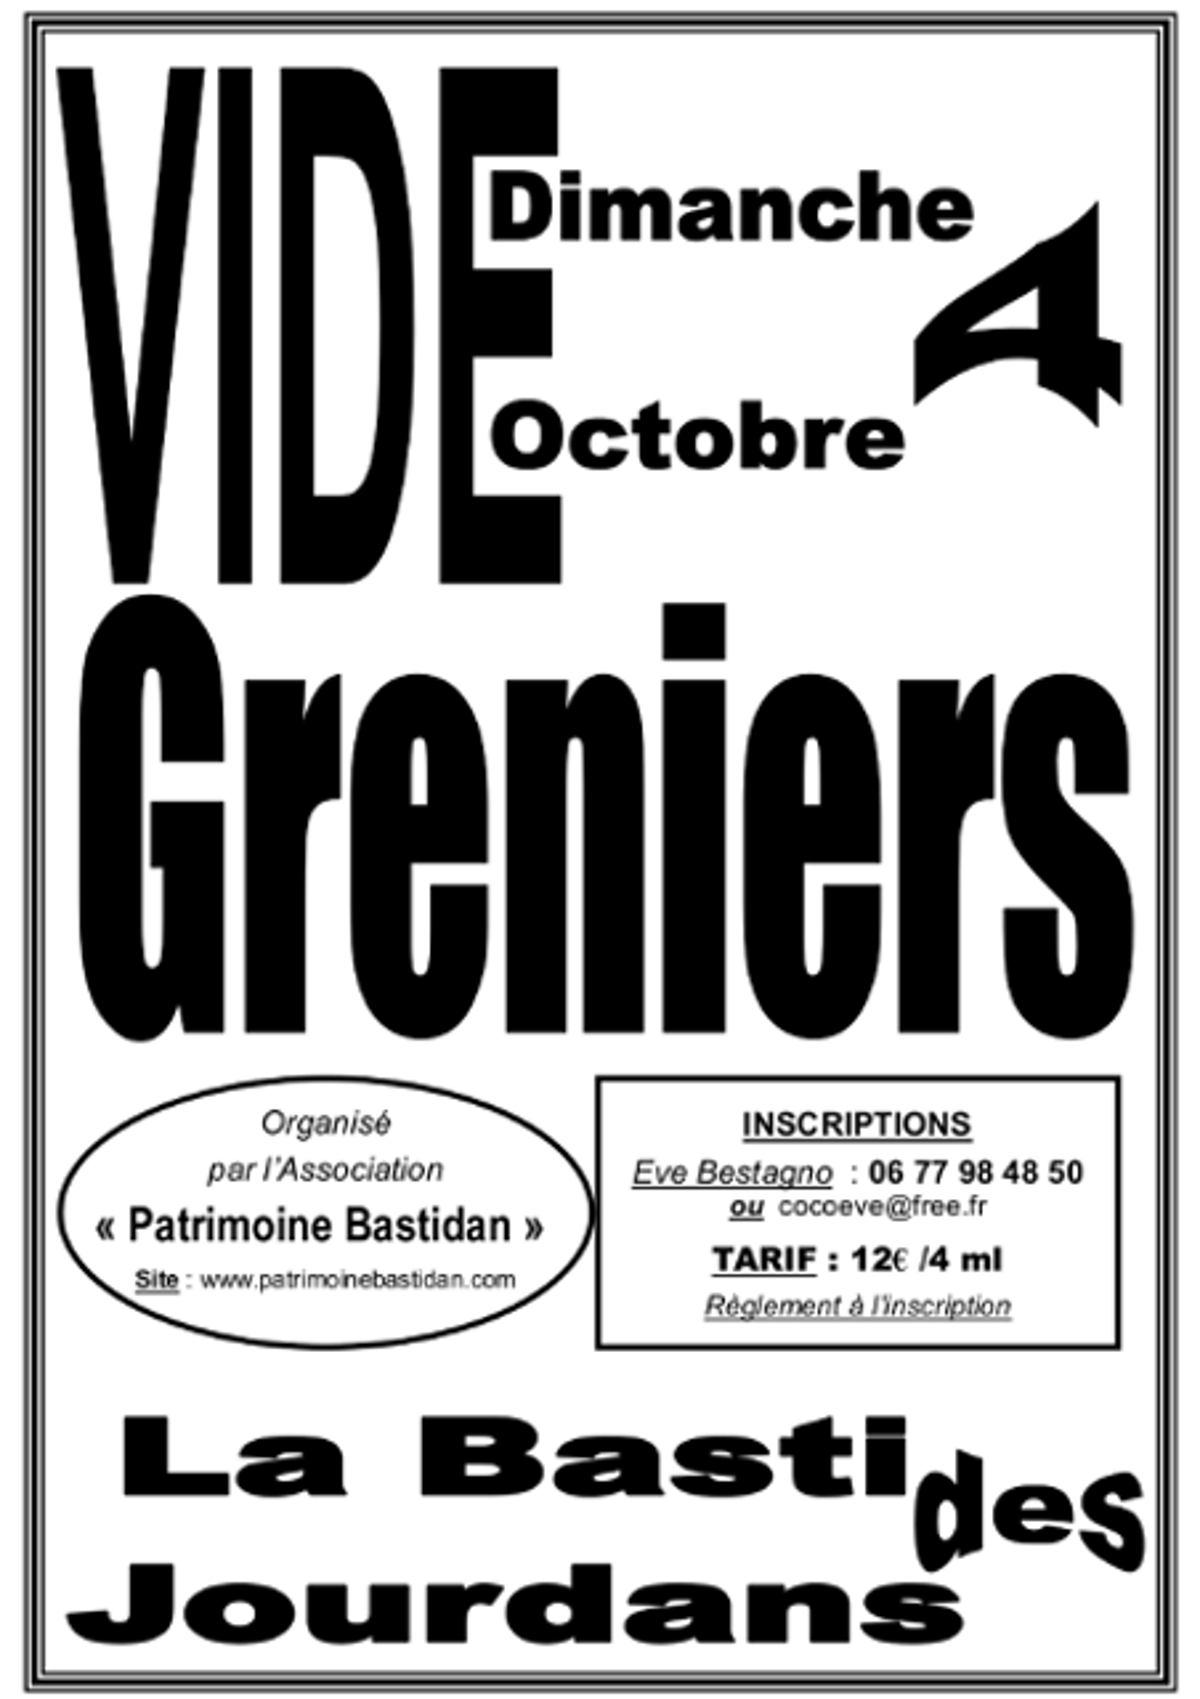 Vide grenier la bastide des jourdans - Vide grenier 77 2015 ...